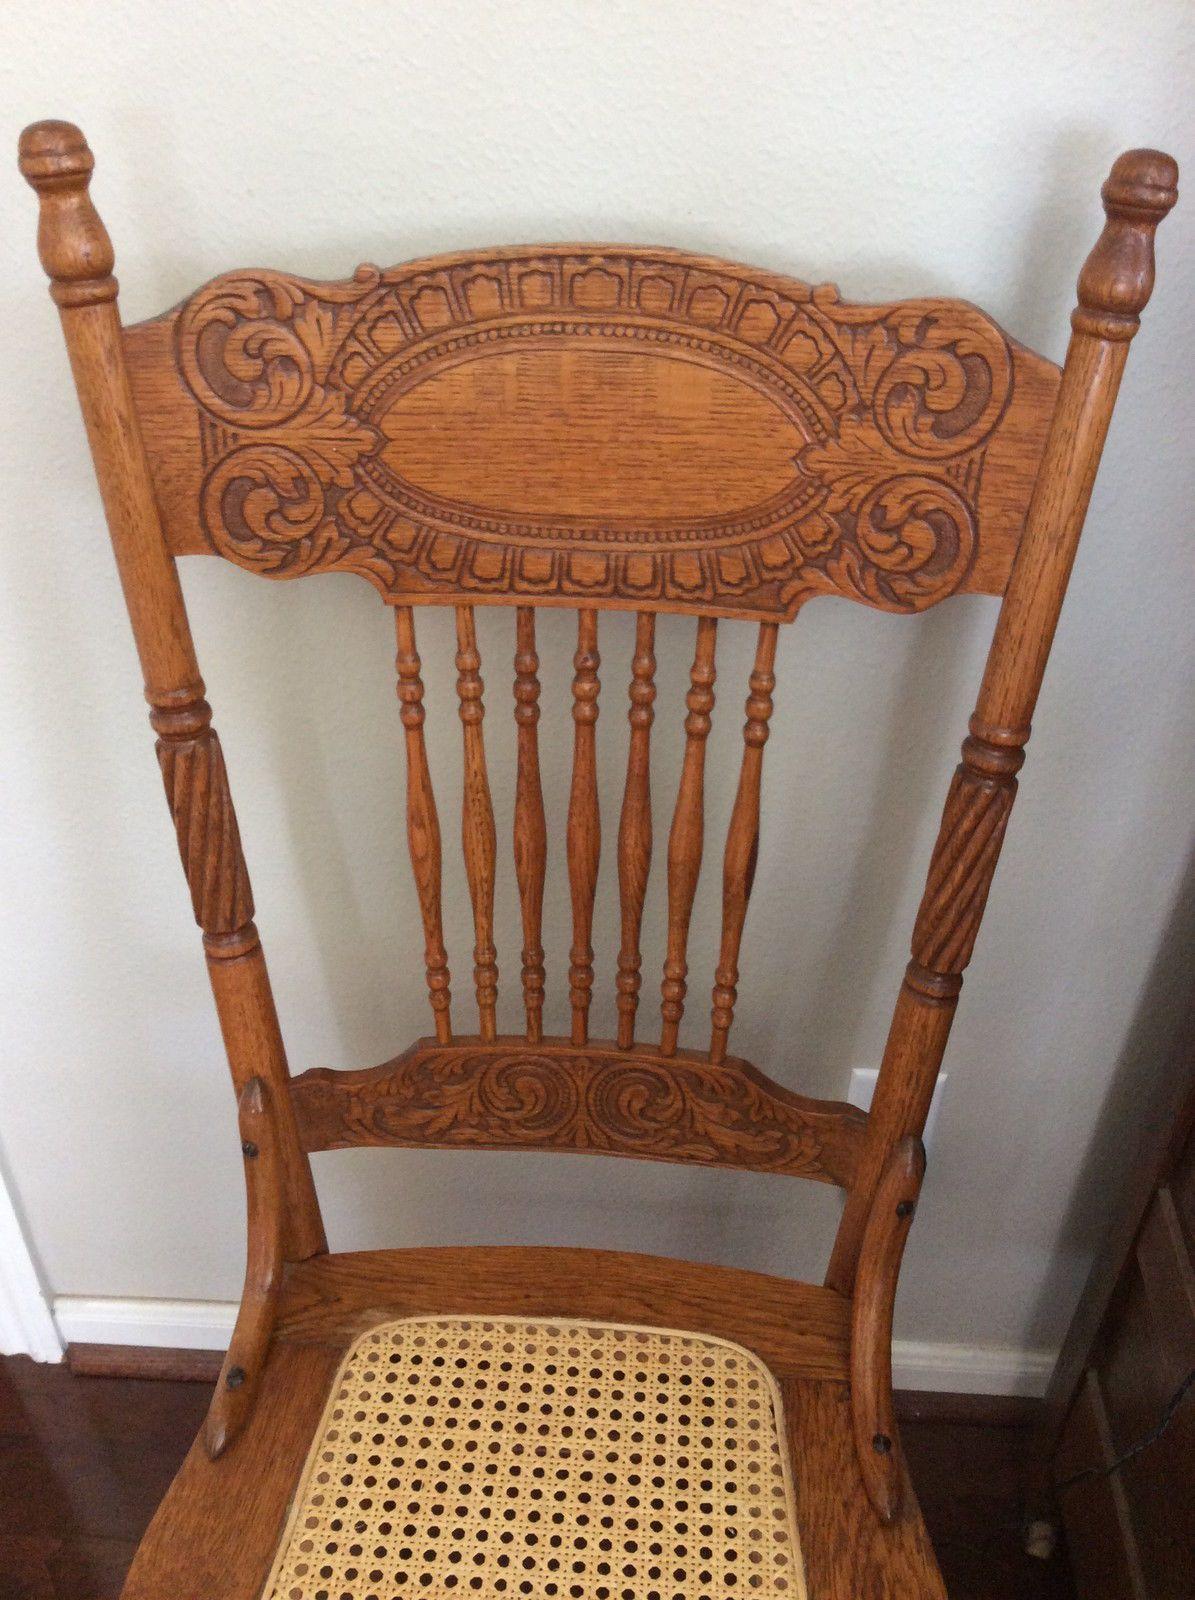 ANTIQUE OAK LARKIN #1 Pressed Back Chairs-Circa 1900-Cane Seat-matching - ANTIQUE OAK LARKIN #1 Pressed Back Chairs-Circa 1900-Cane Seat